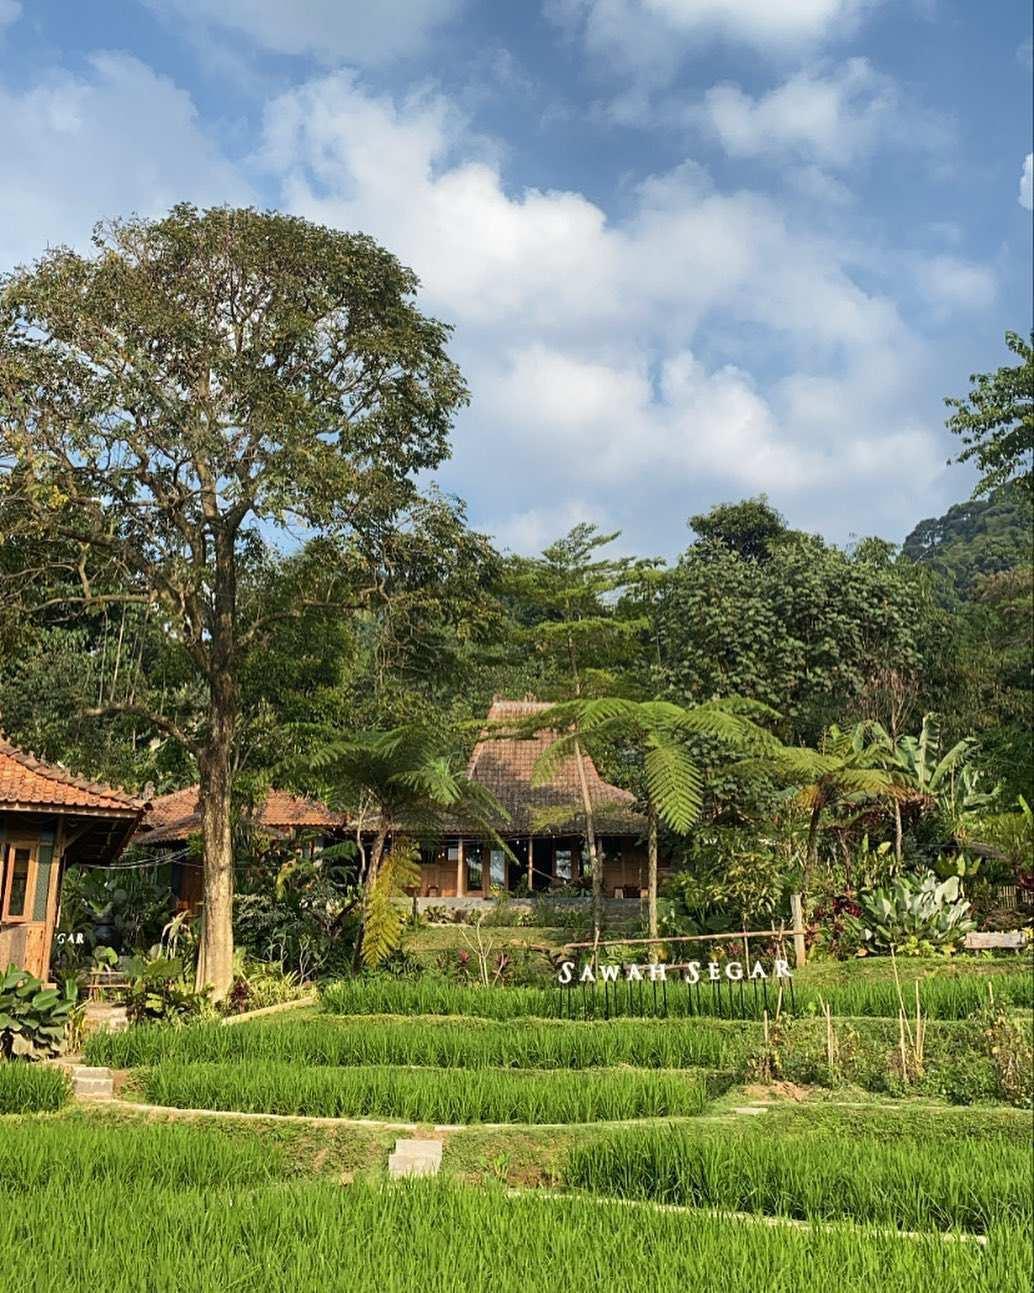 Pemandangan Joglo dan Persawahan di Sawah Segar Sentul Bogor Image From @sawahsegarsentul